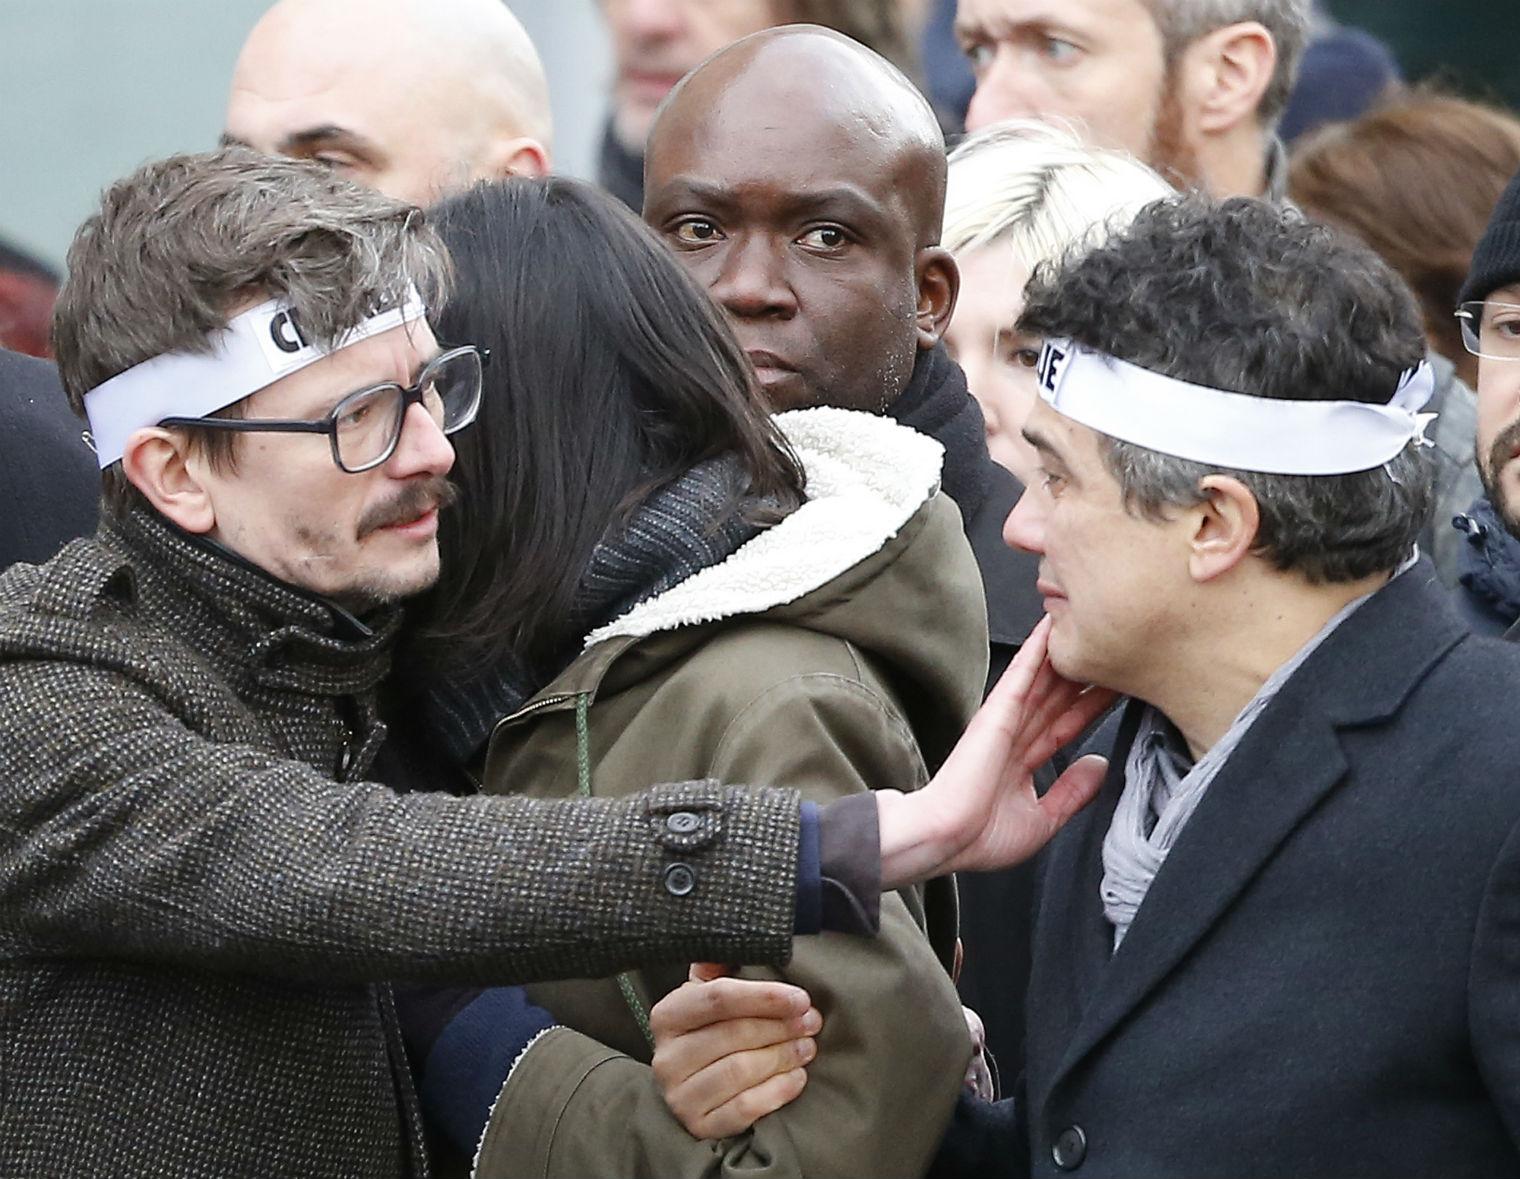 Charlie Hebdo cartoonist Luz comforts colleague, writer Patrick Pelloux.